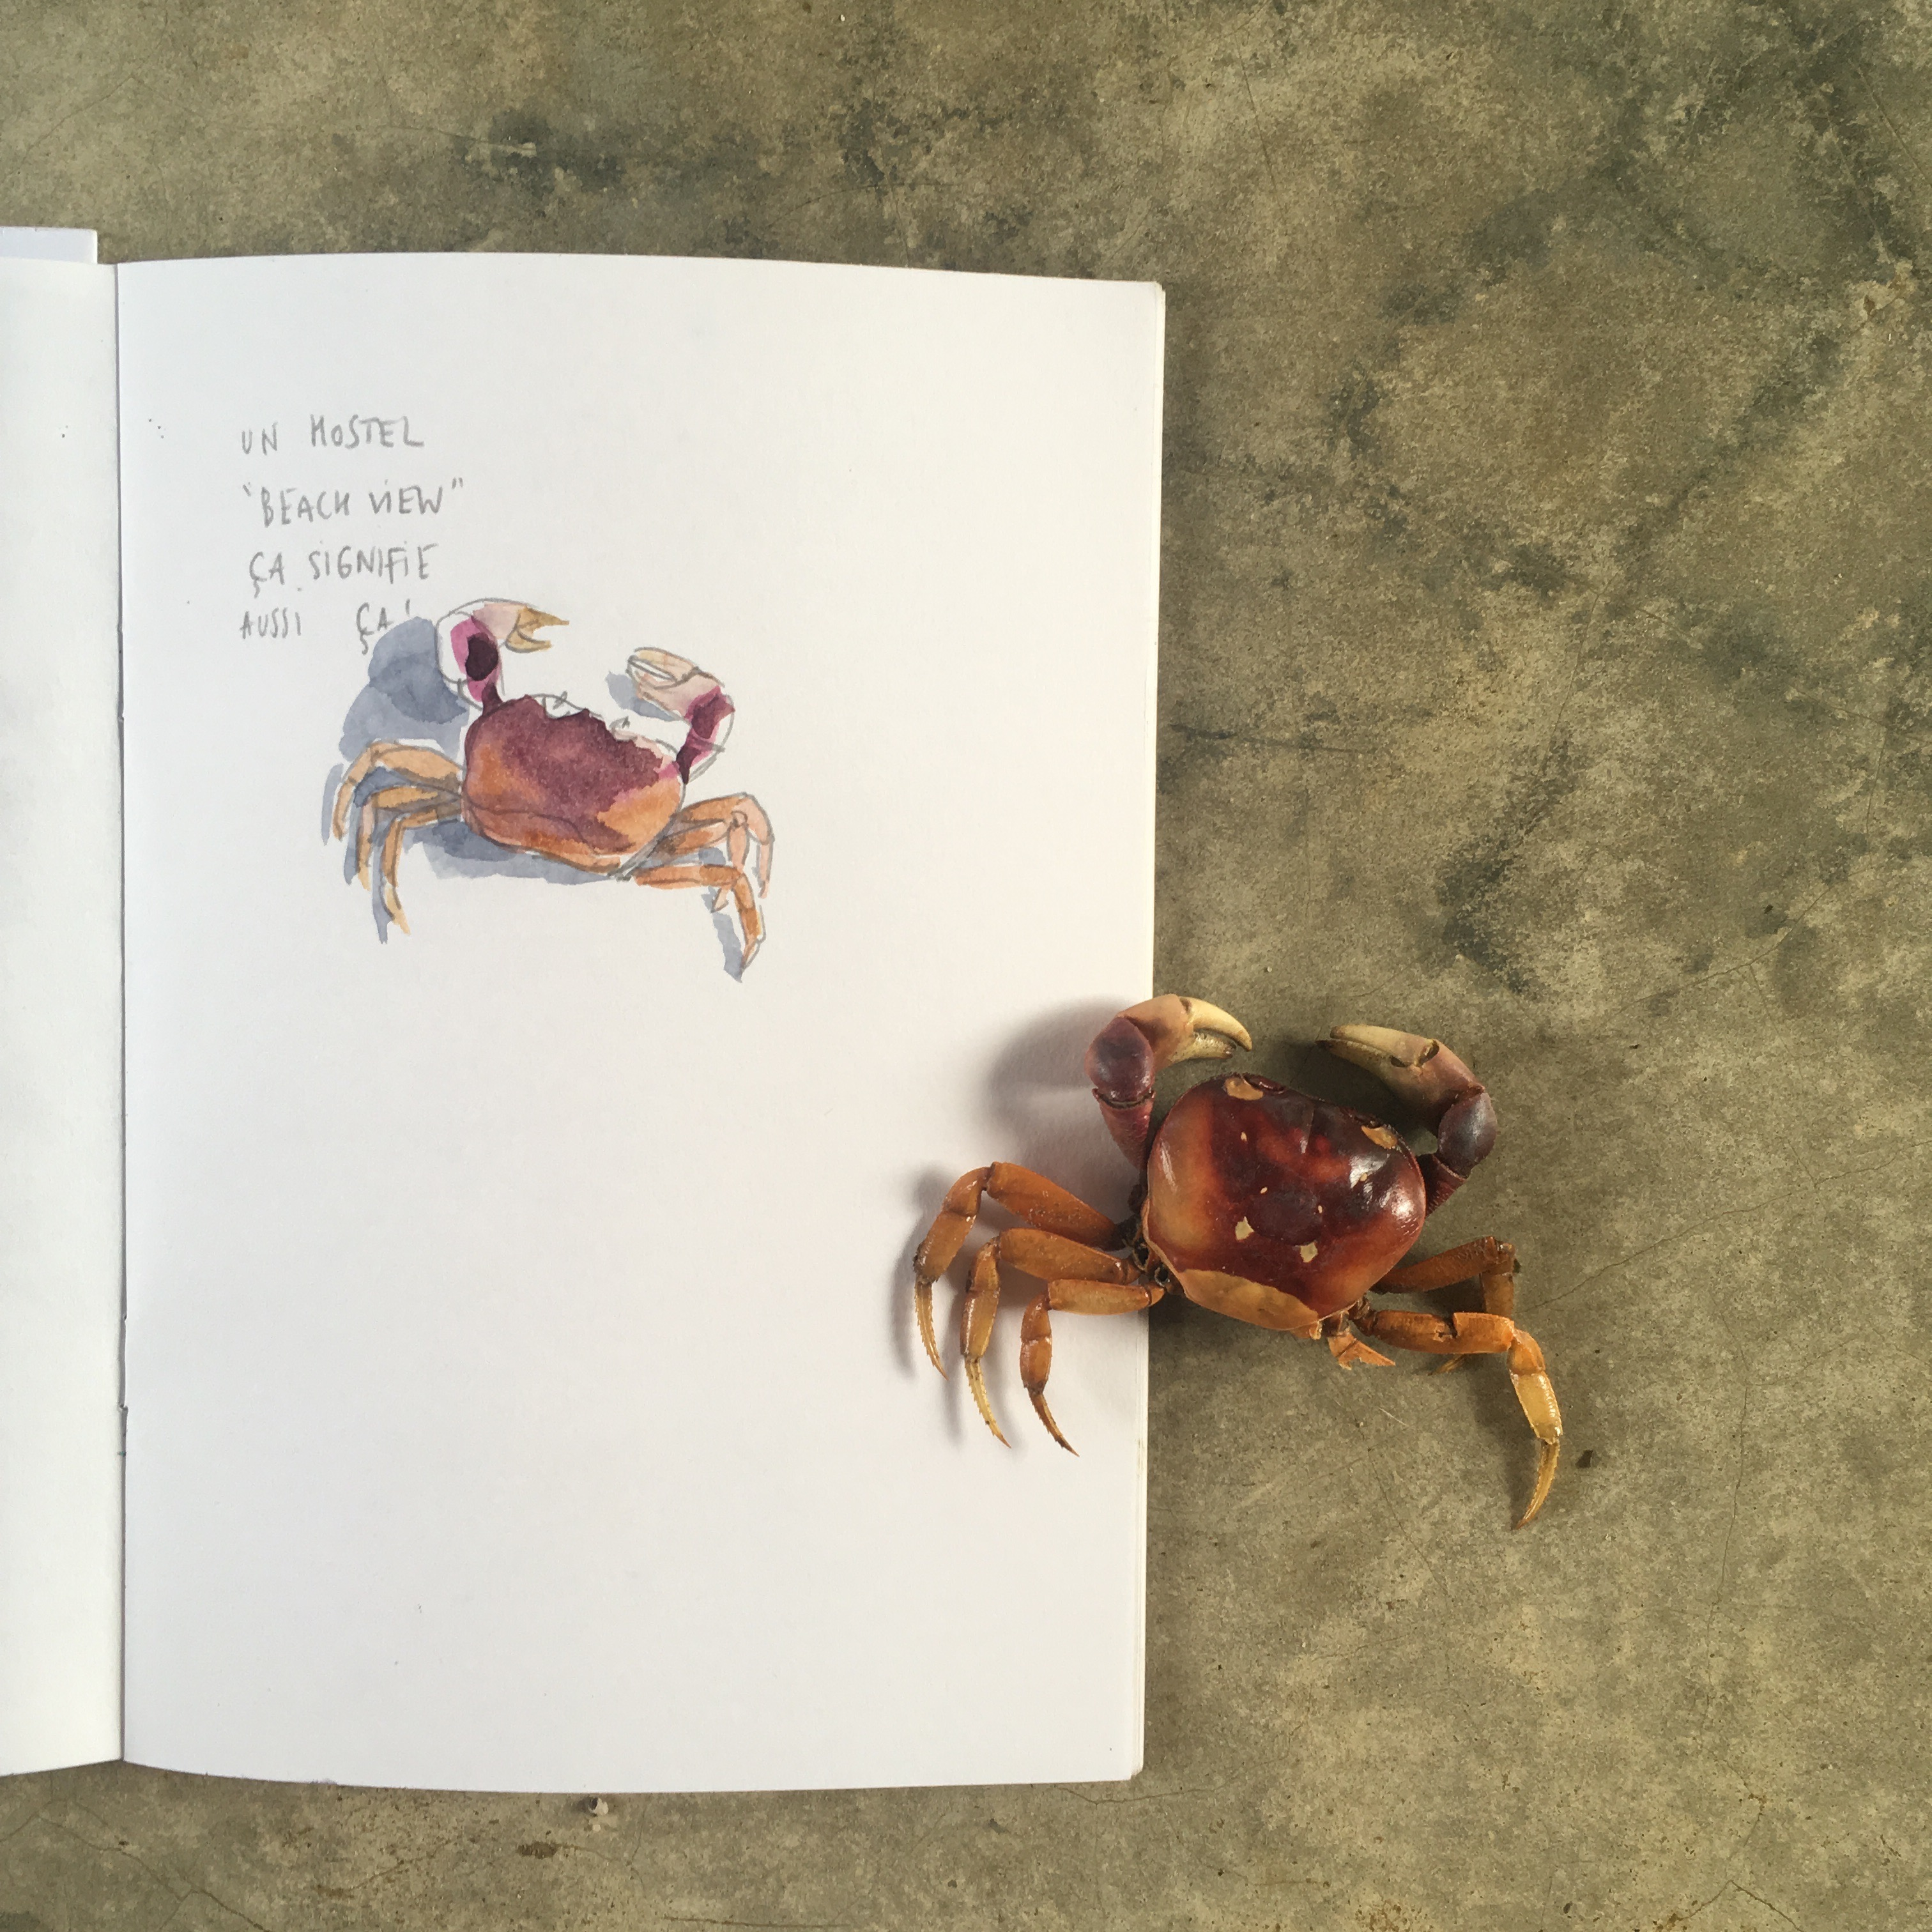 crabe-playa-venao-cove-hostel